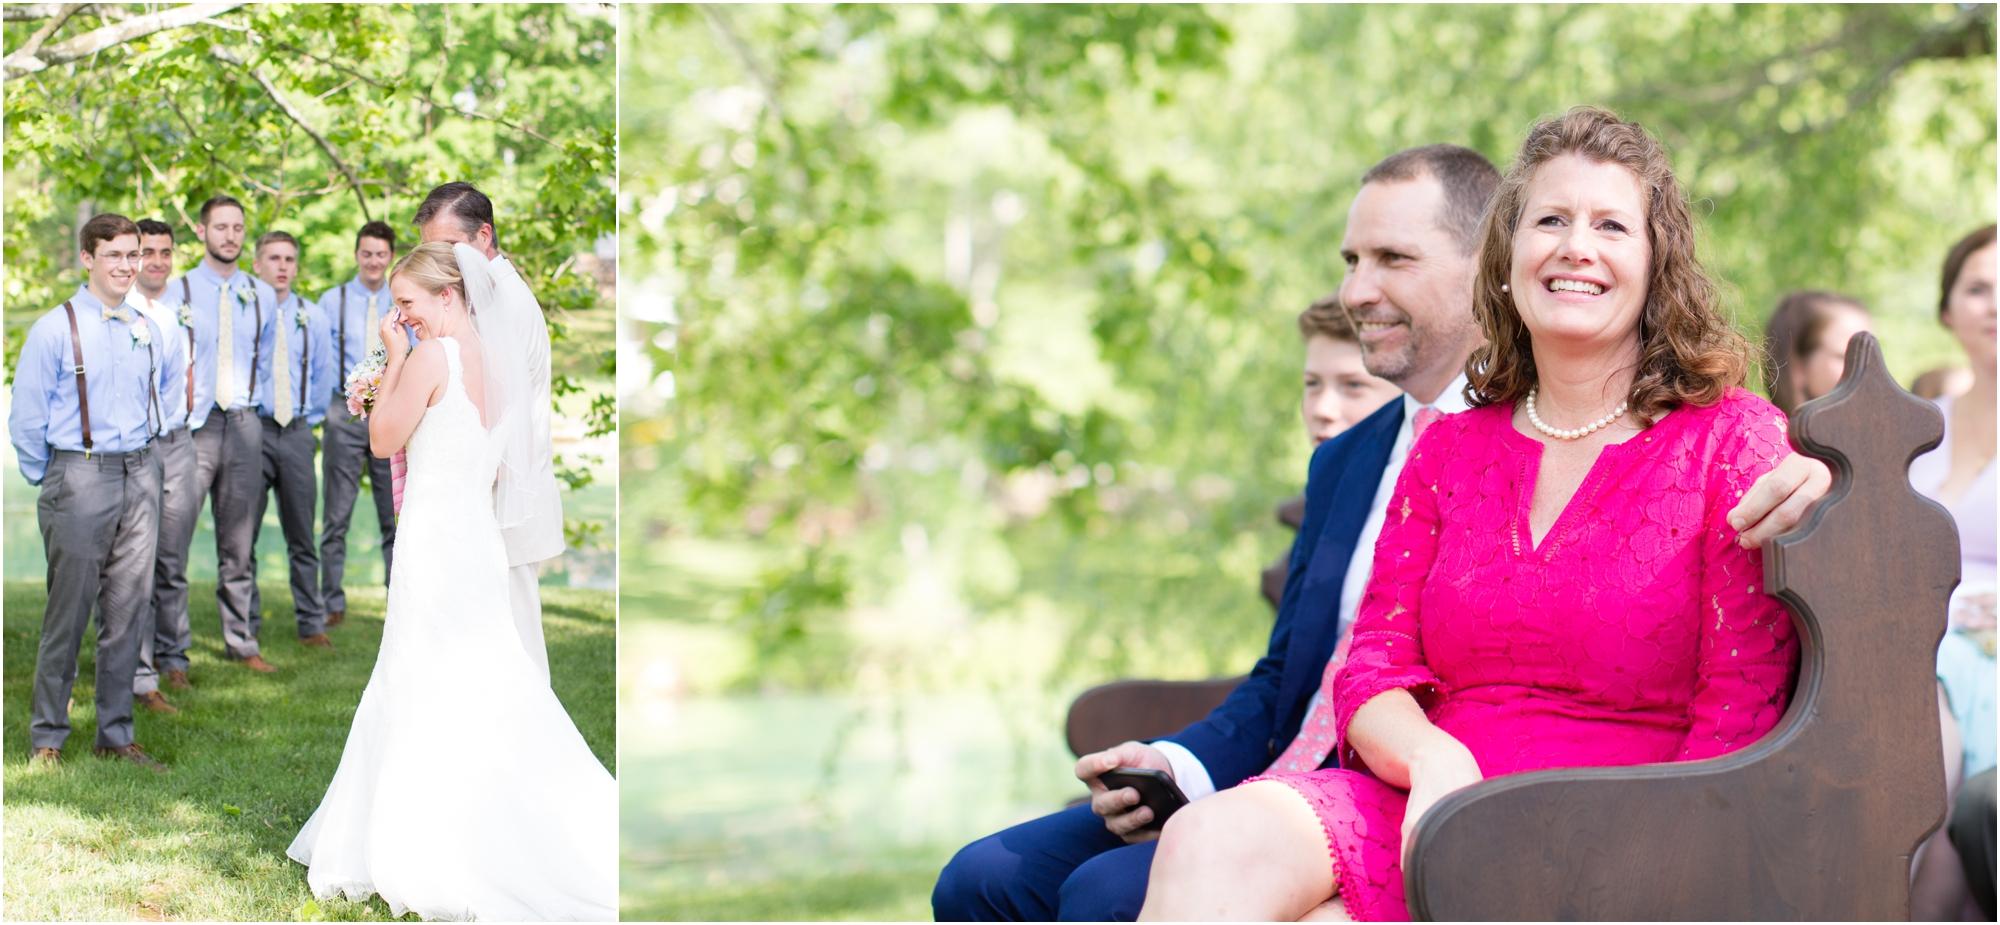 4-Rittler Wedding Ceremony-935.jpg